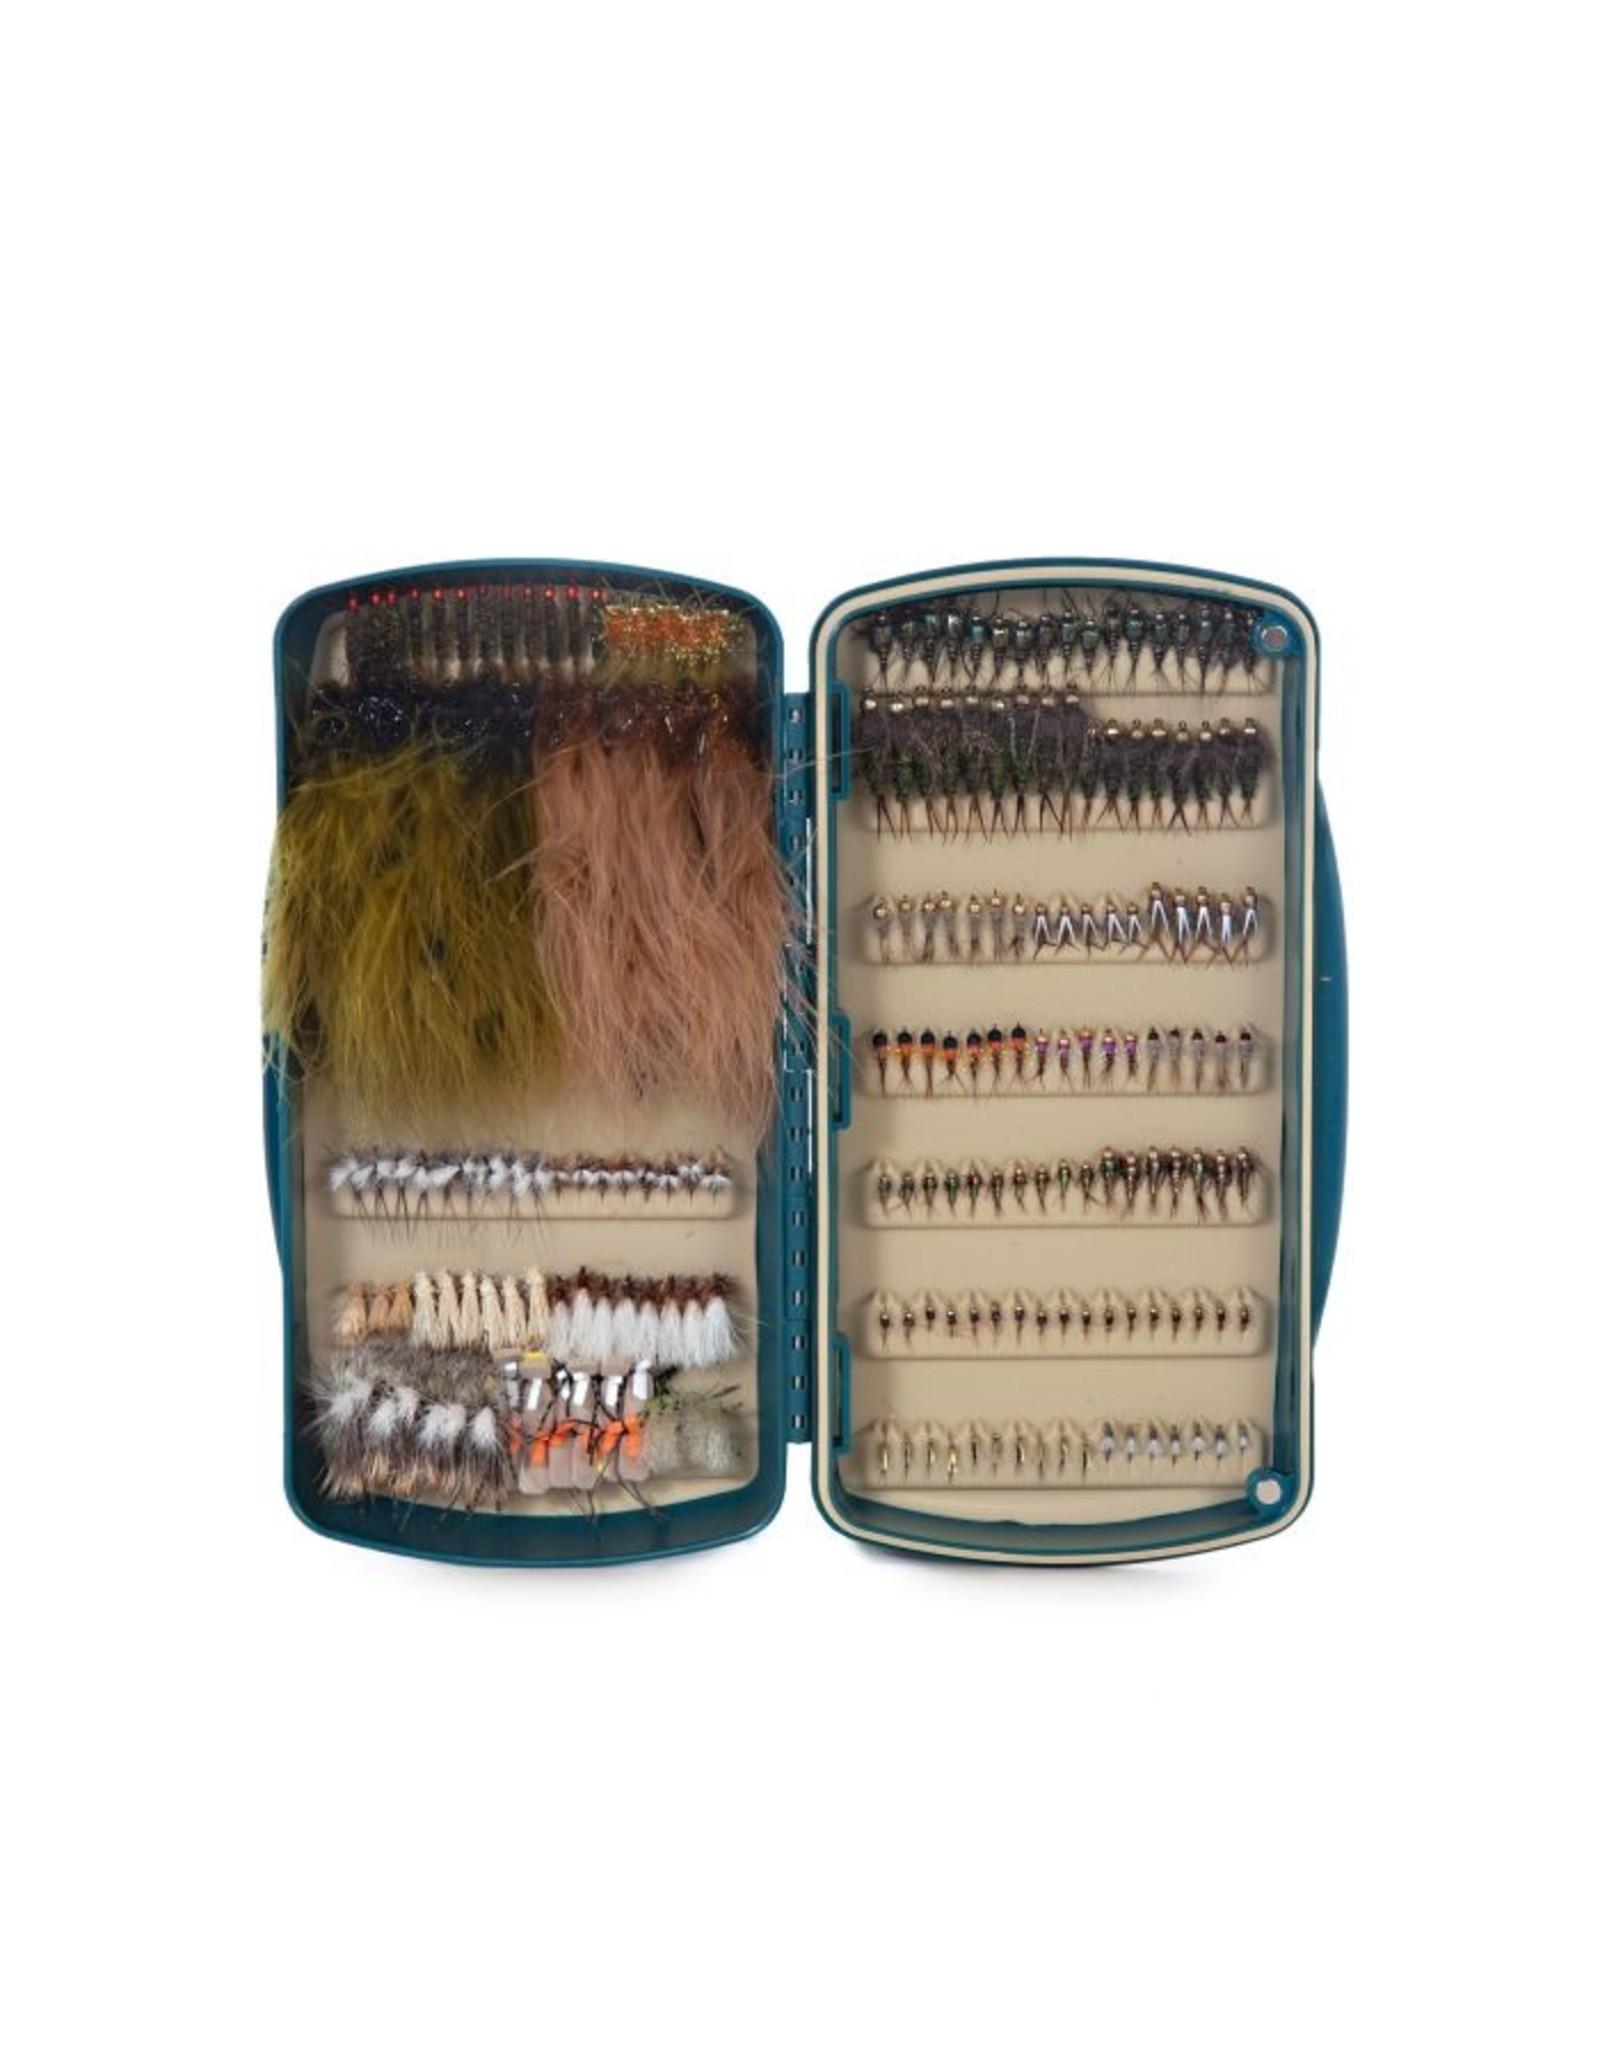 Fishpond Fishpond - Tacky Pescador Large Flybox